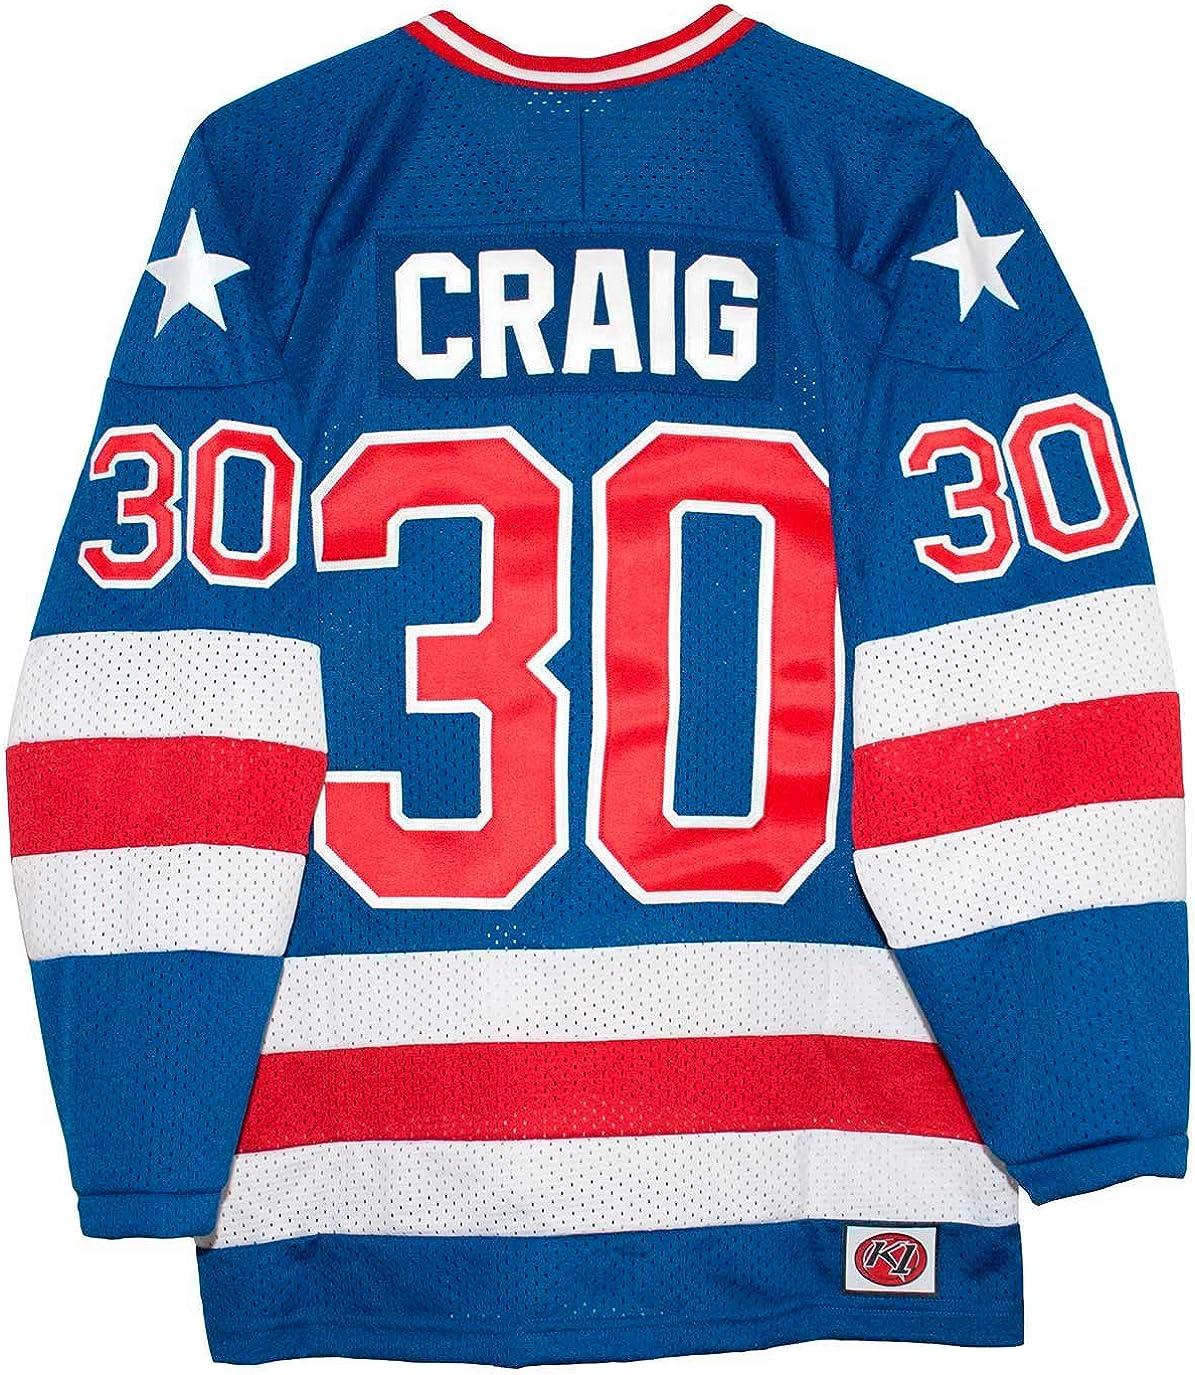 K-1 Sportswear USA Miracle on Ice 1980 Jim Craig Blue Hockey Jersey